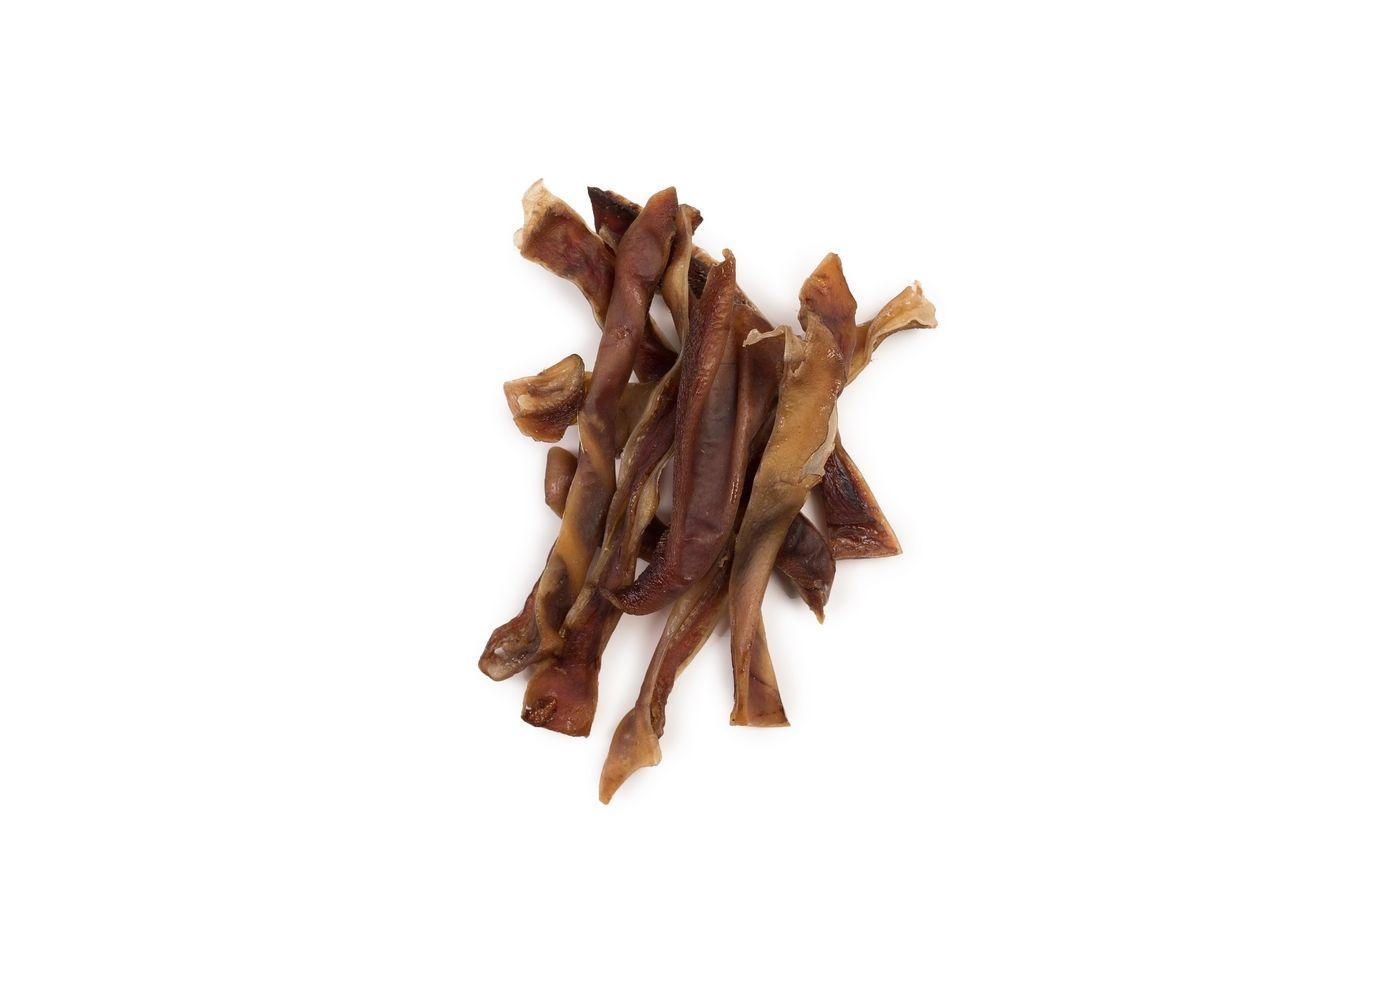 Baconslice 2 kg